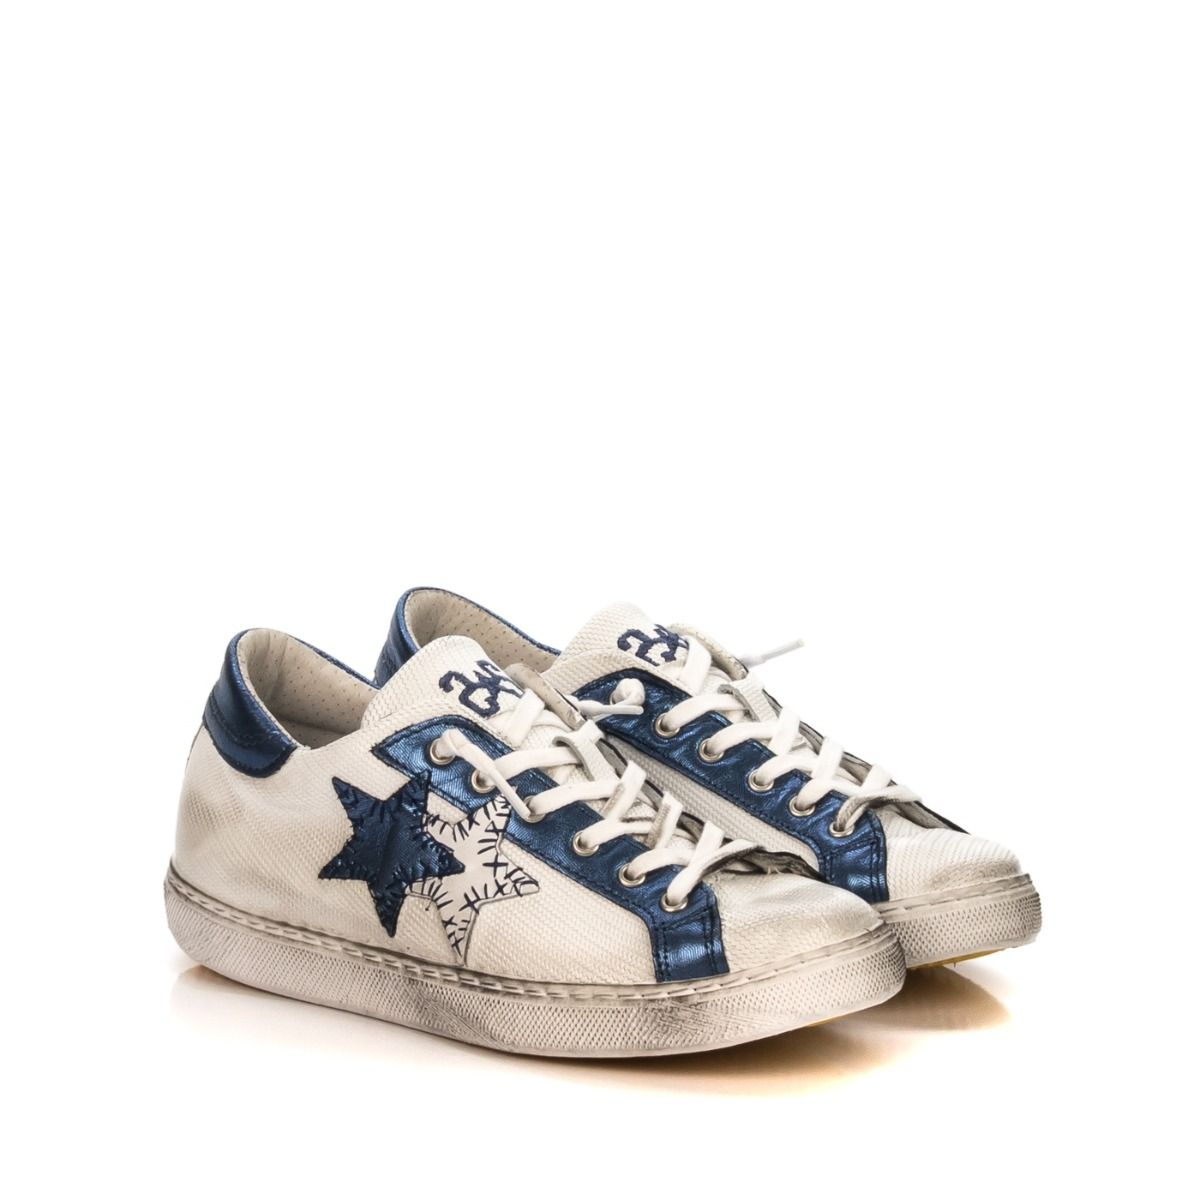 Sneakers da donna 2STAR 2SD1829 in pelle bianco e blu